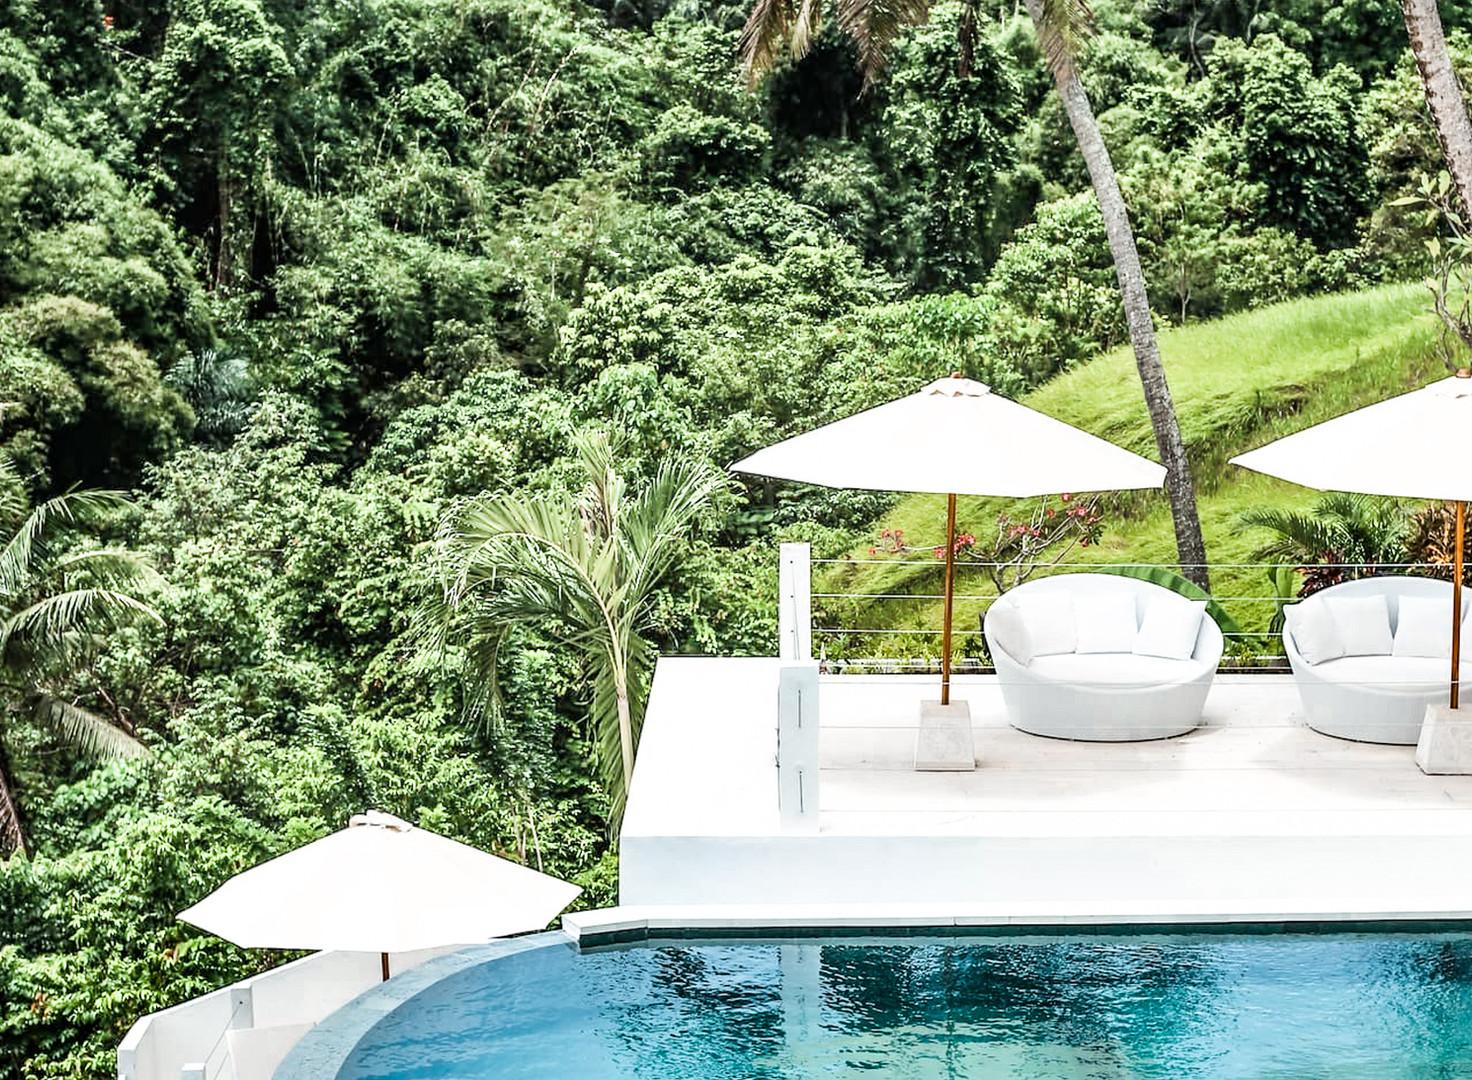 Ubud Villa Pool and Loungers